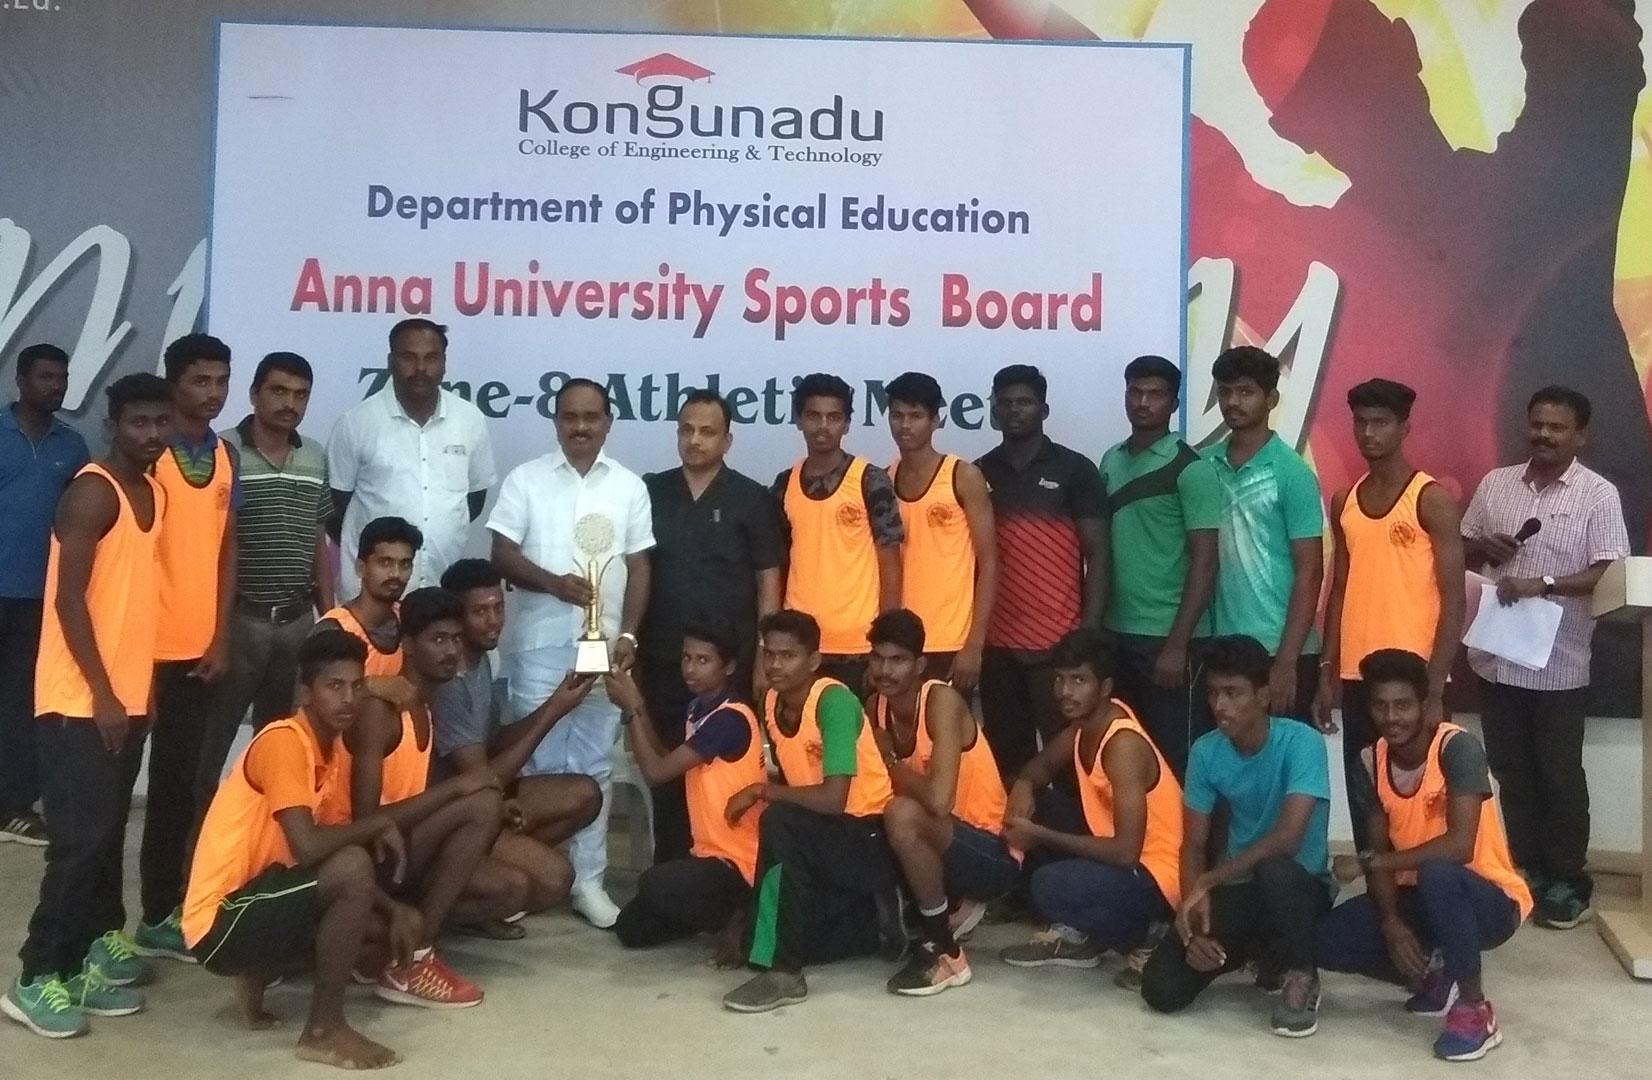 Anna University Zone-8 Athletics Men Winners held at Kongu Nadu College of Engineering & Technology 1